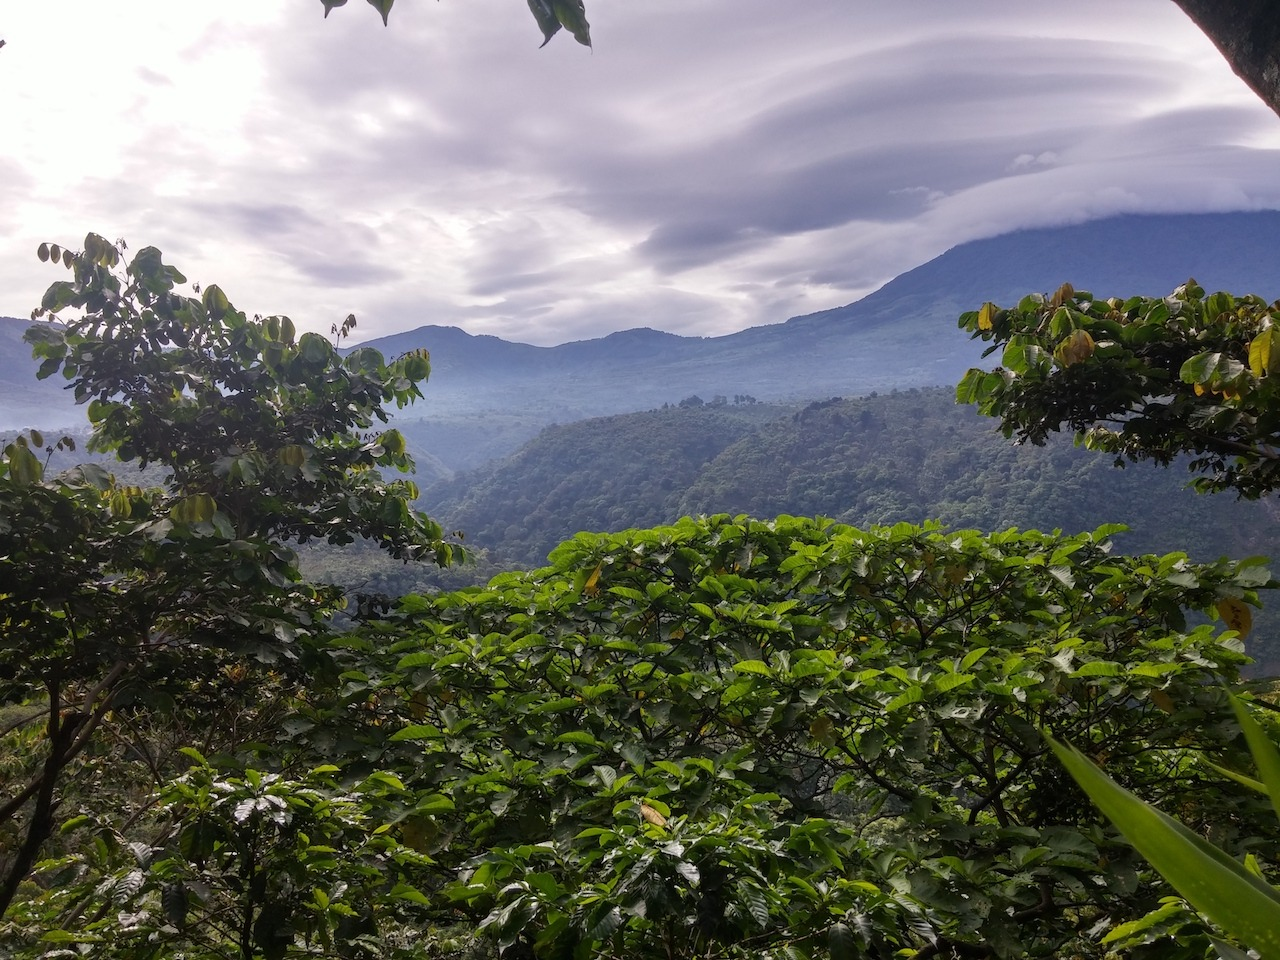 anbassa-artisan-torrefacteur-cafe-guatemala-blackhoney-montedeoro-3